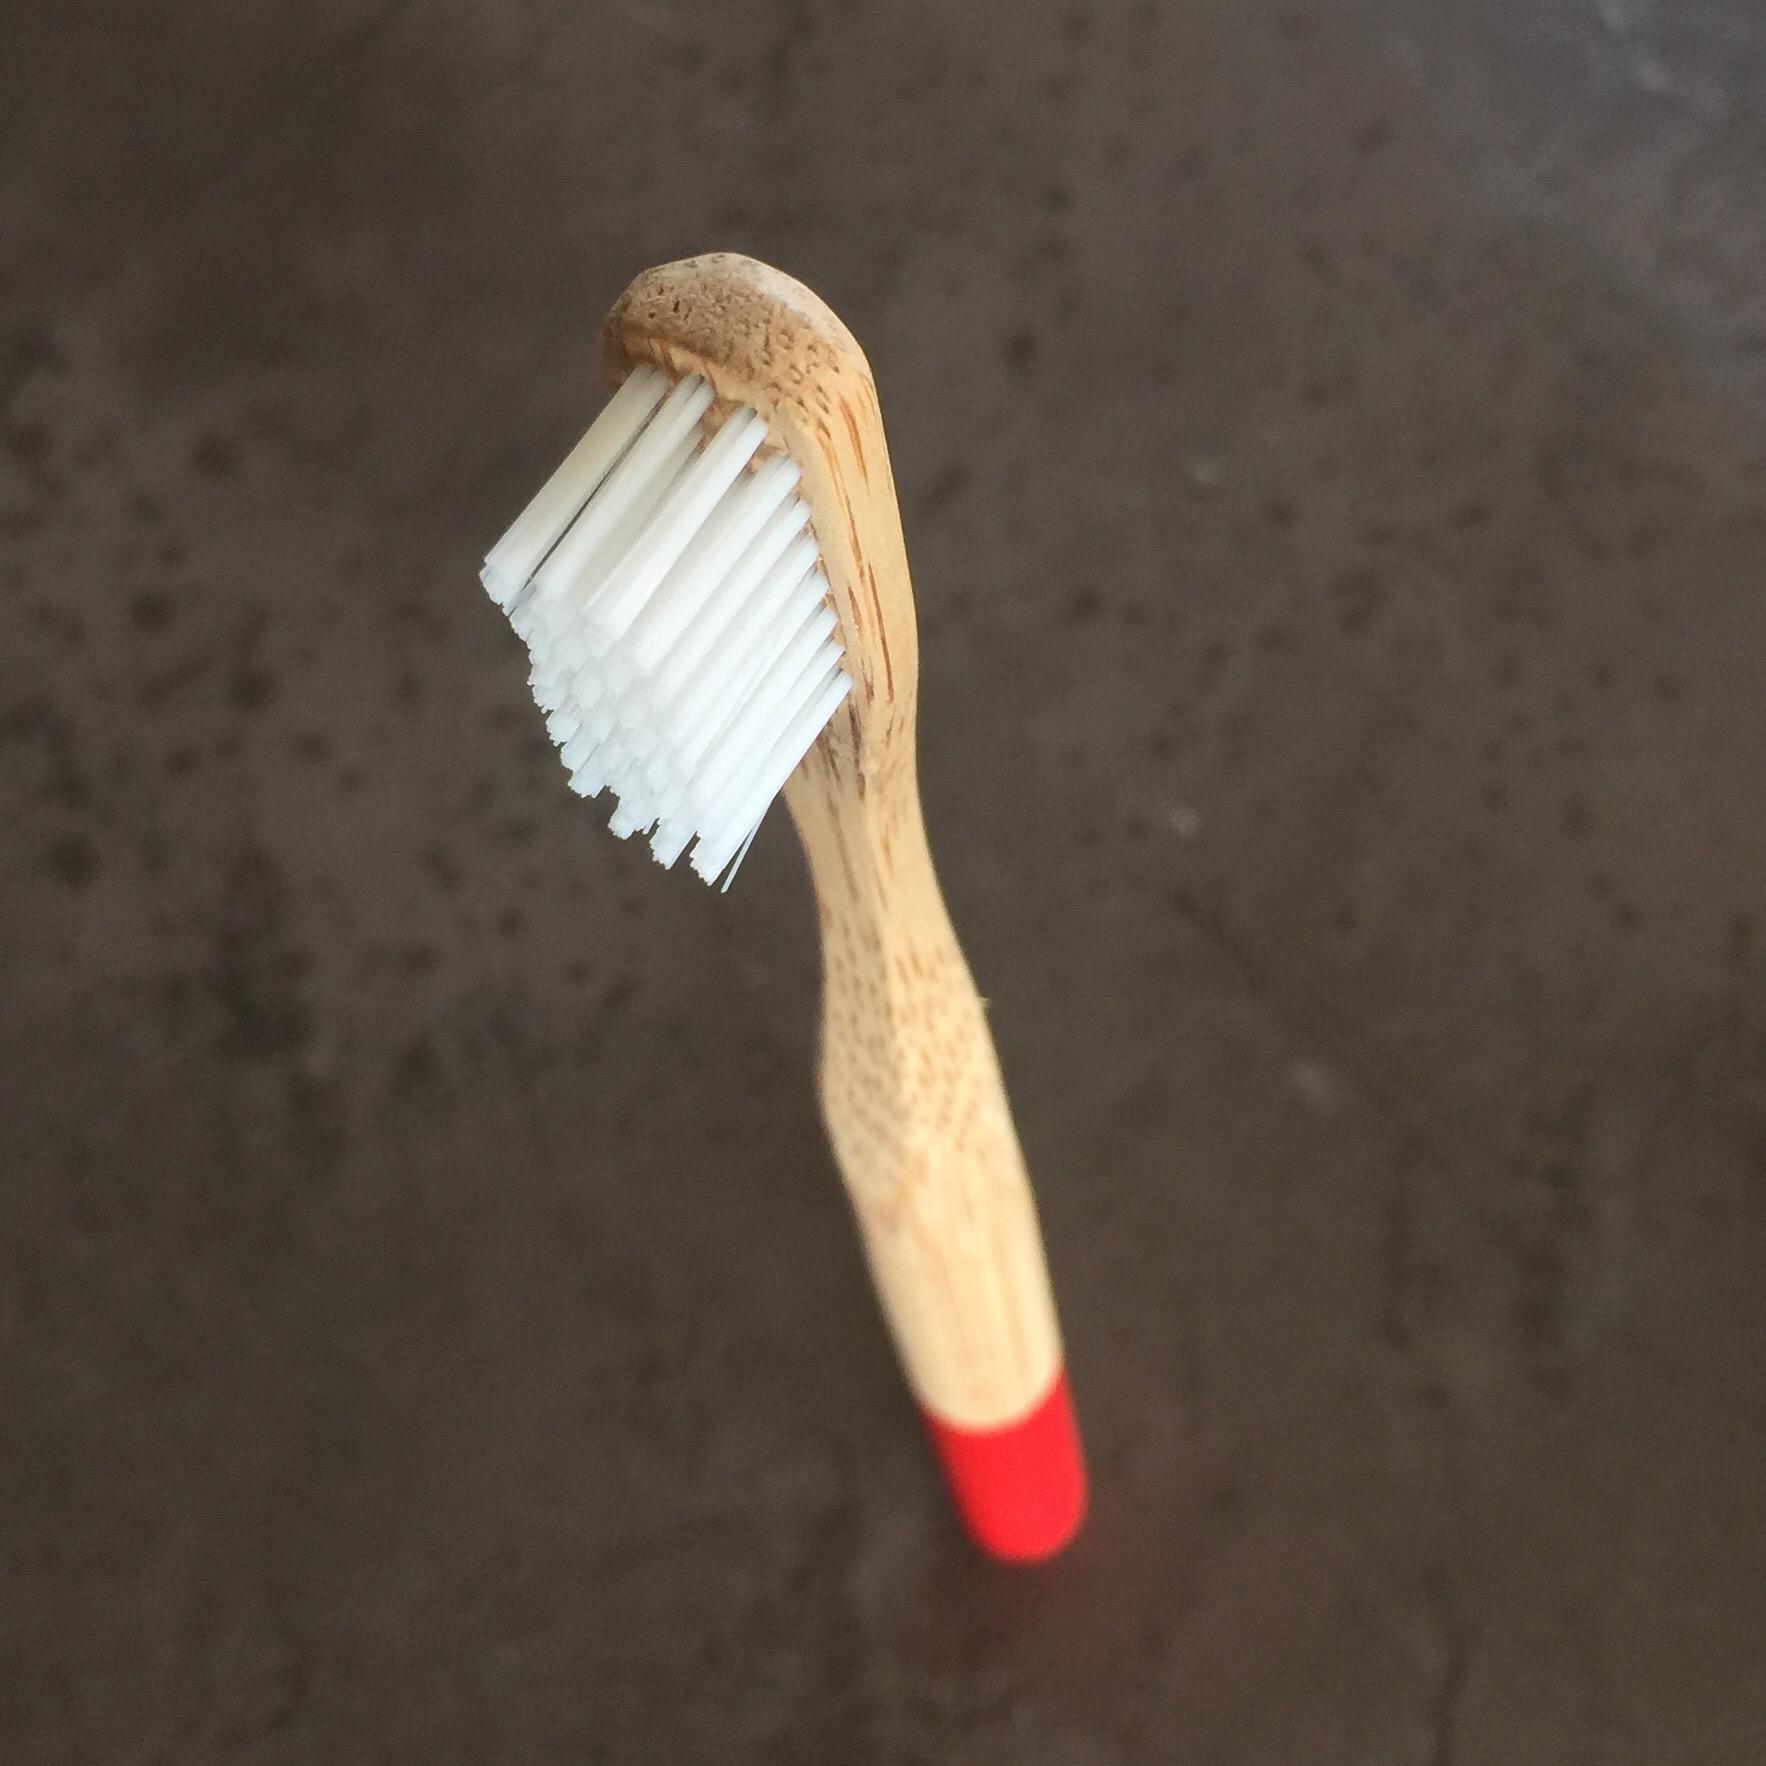 brosse à dent / zahnbürste